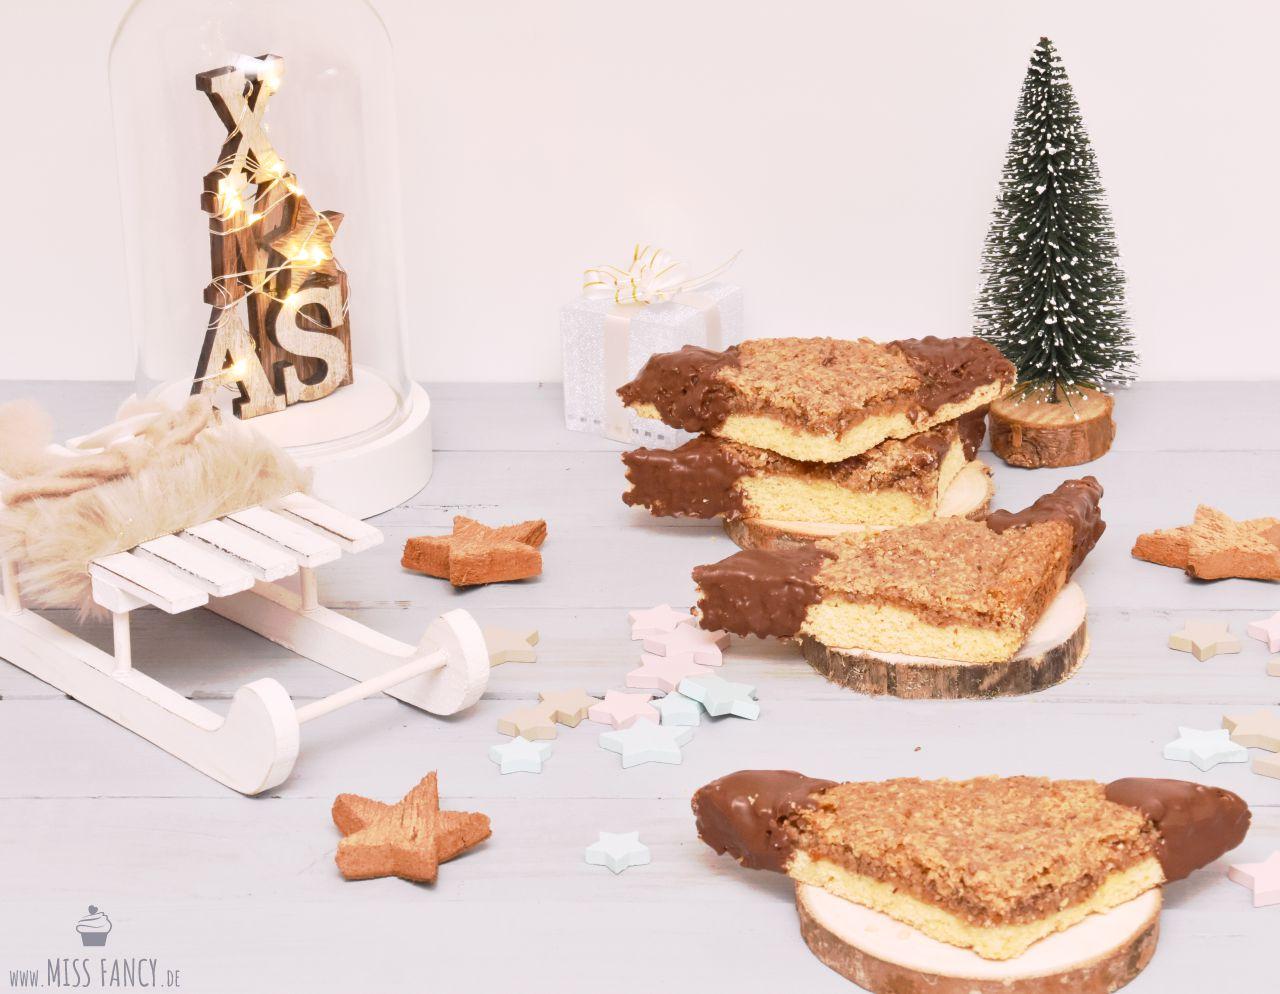 Rezept-klassische-Nussecken-Weihnachten-missfancy.jpg